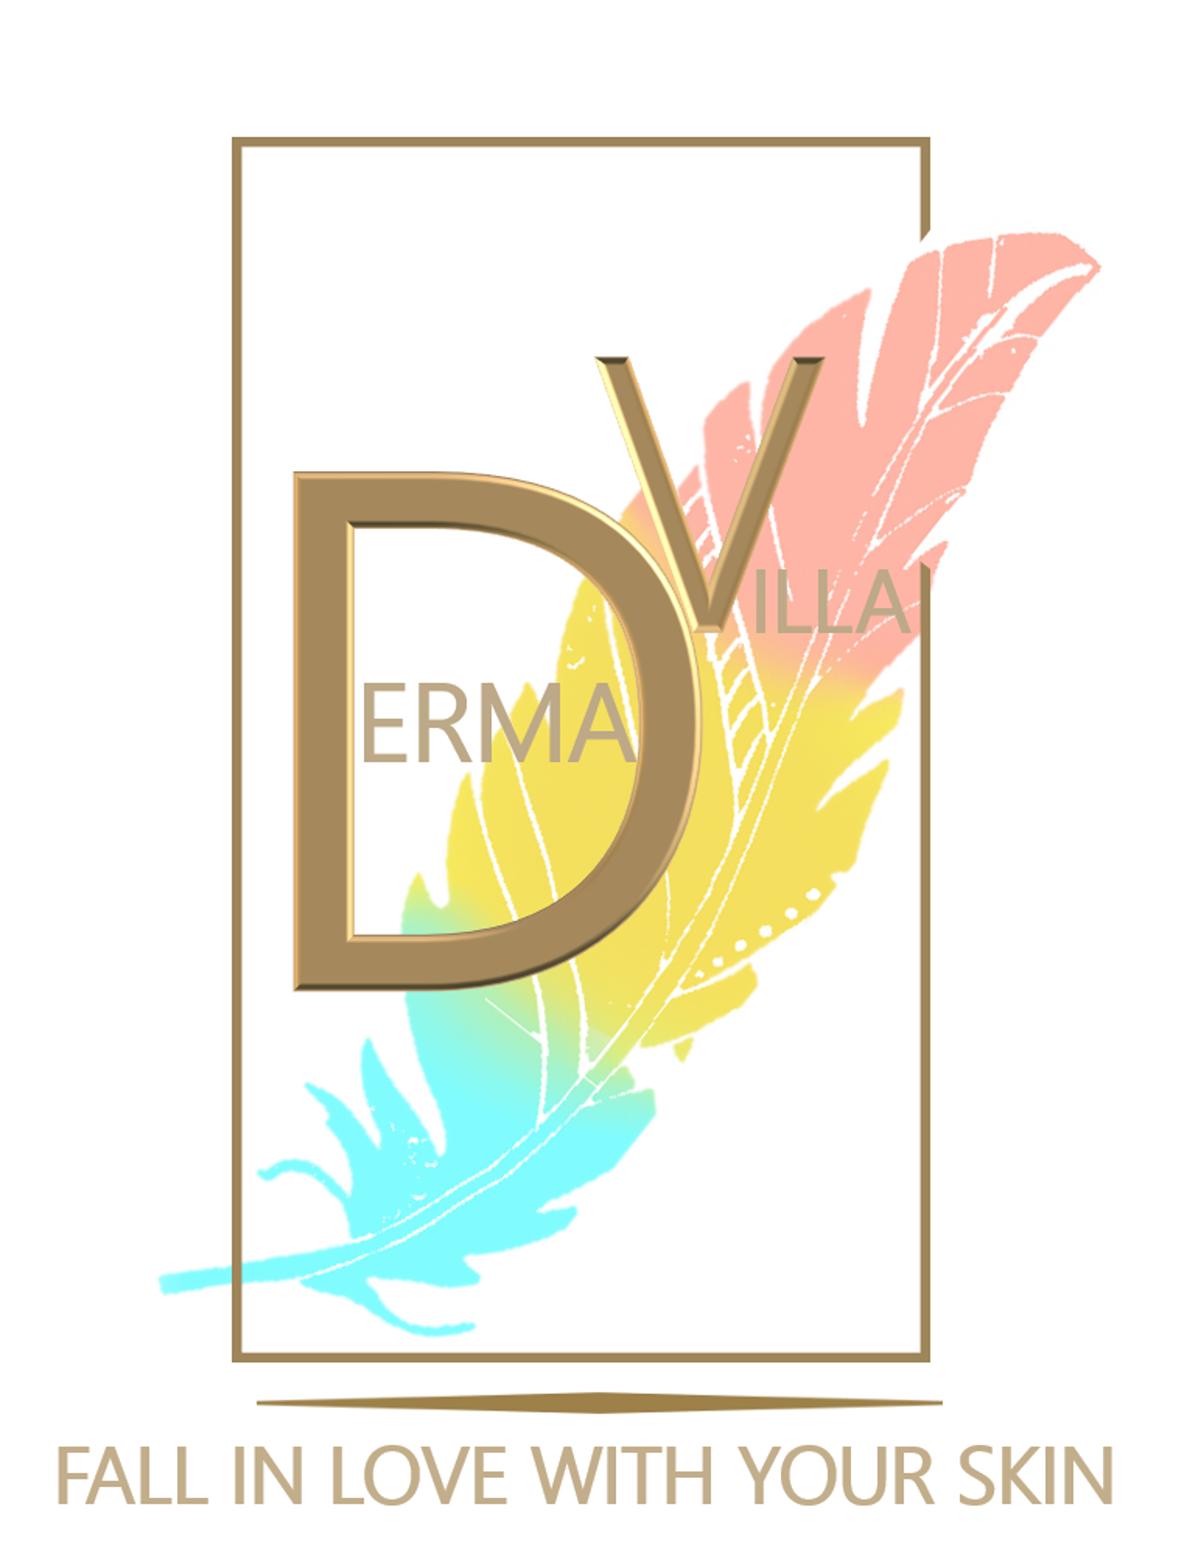 Dermavilla Skin Clinic Best Skin Specialist & Dermatologist in Thane